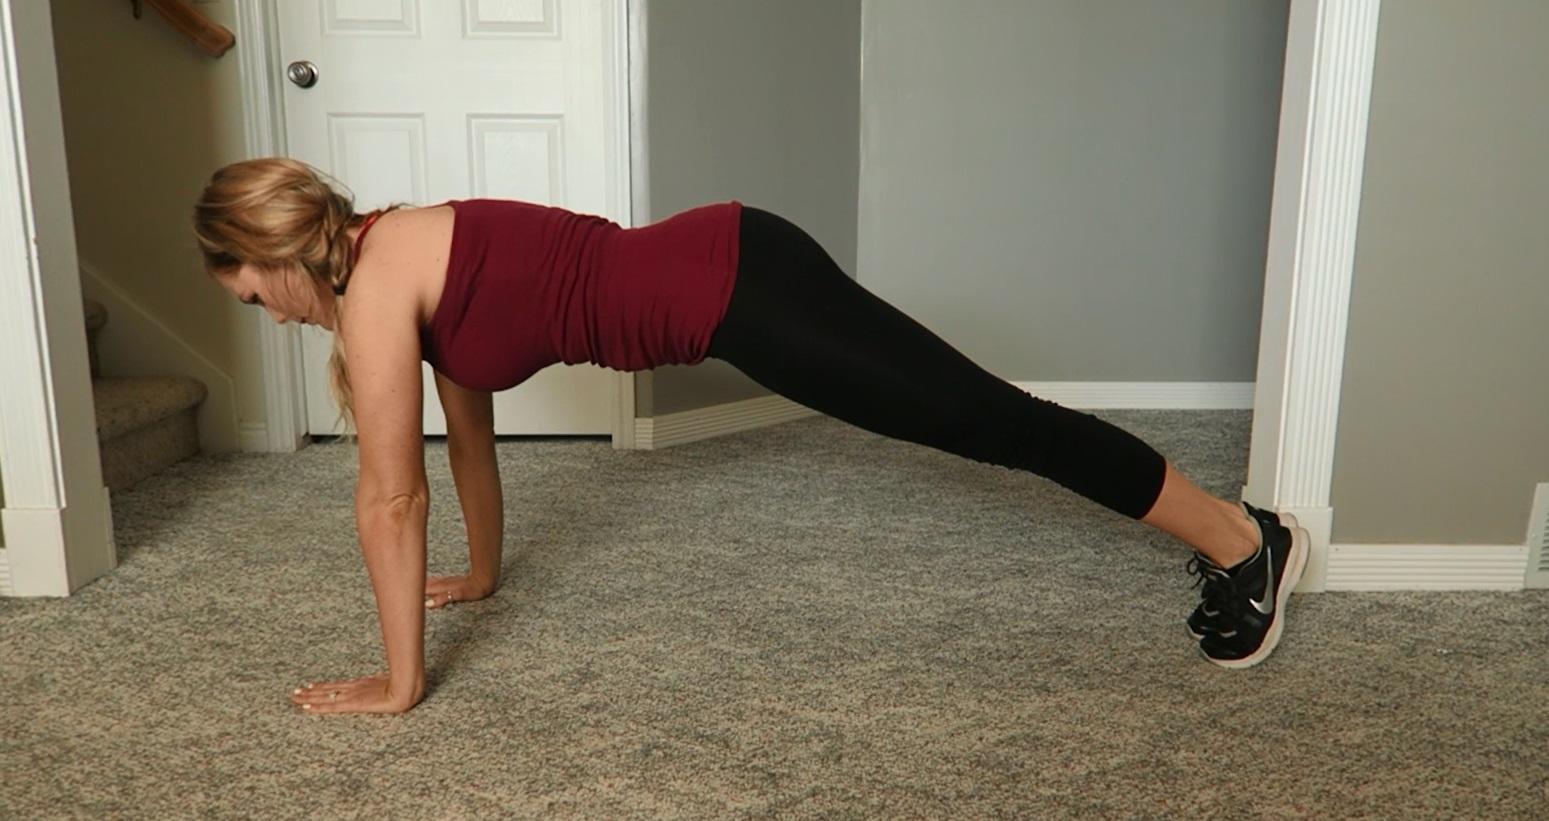 plank push up2adv